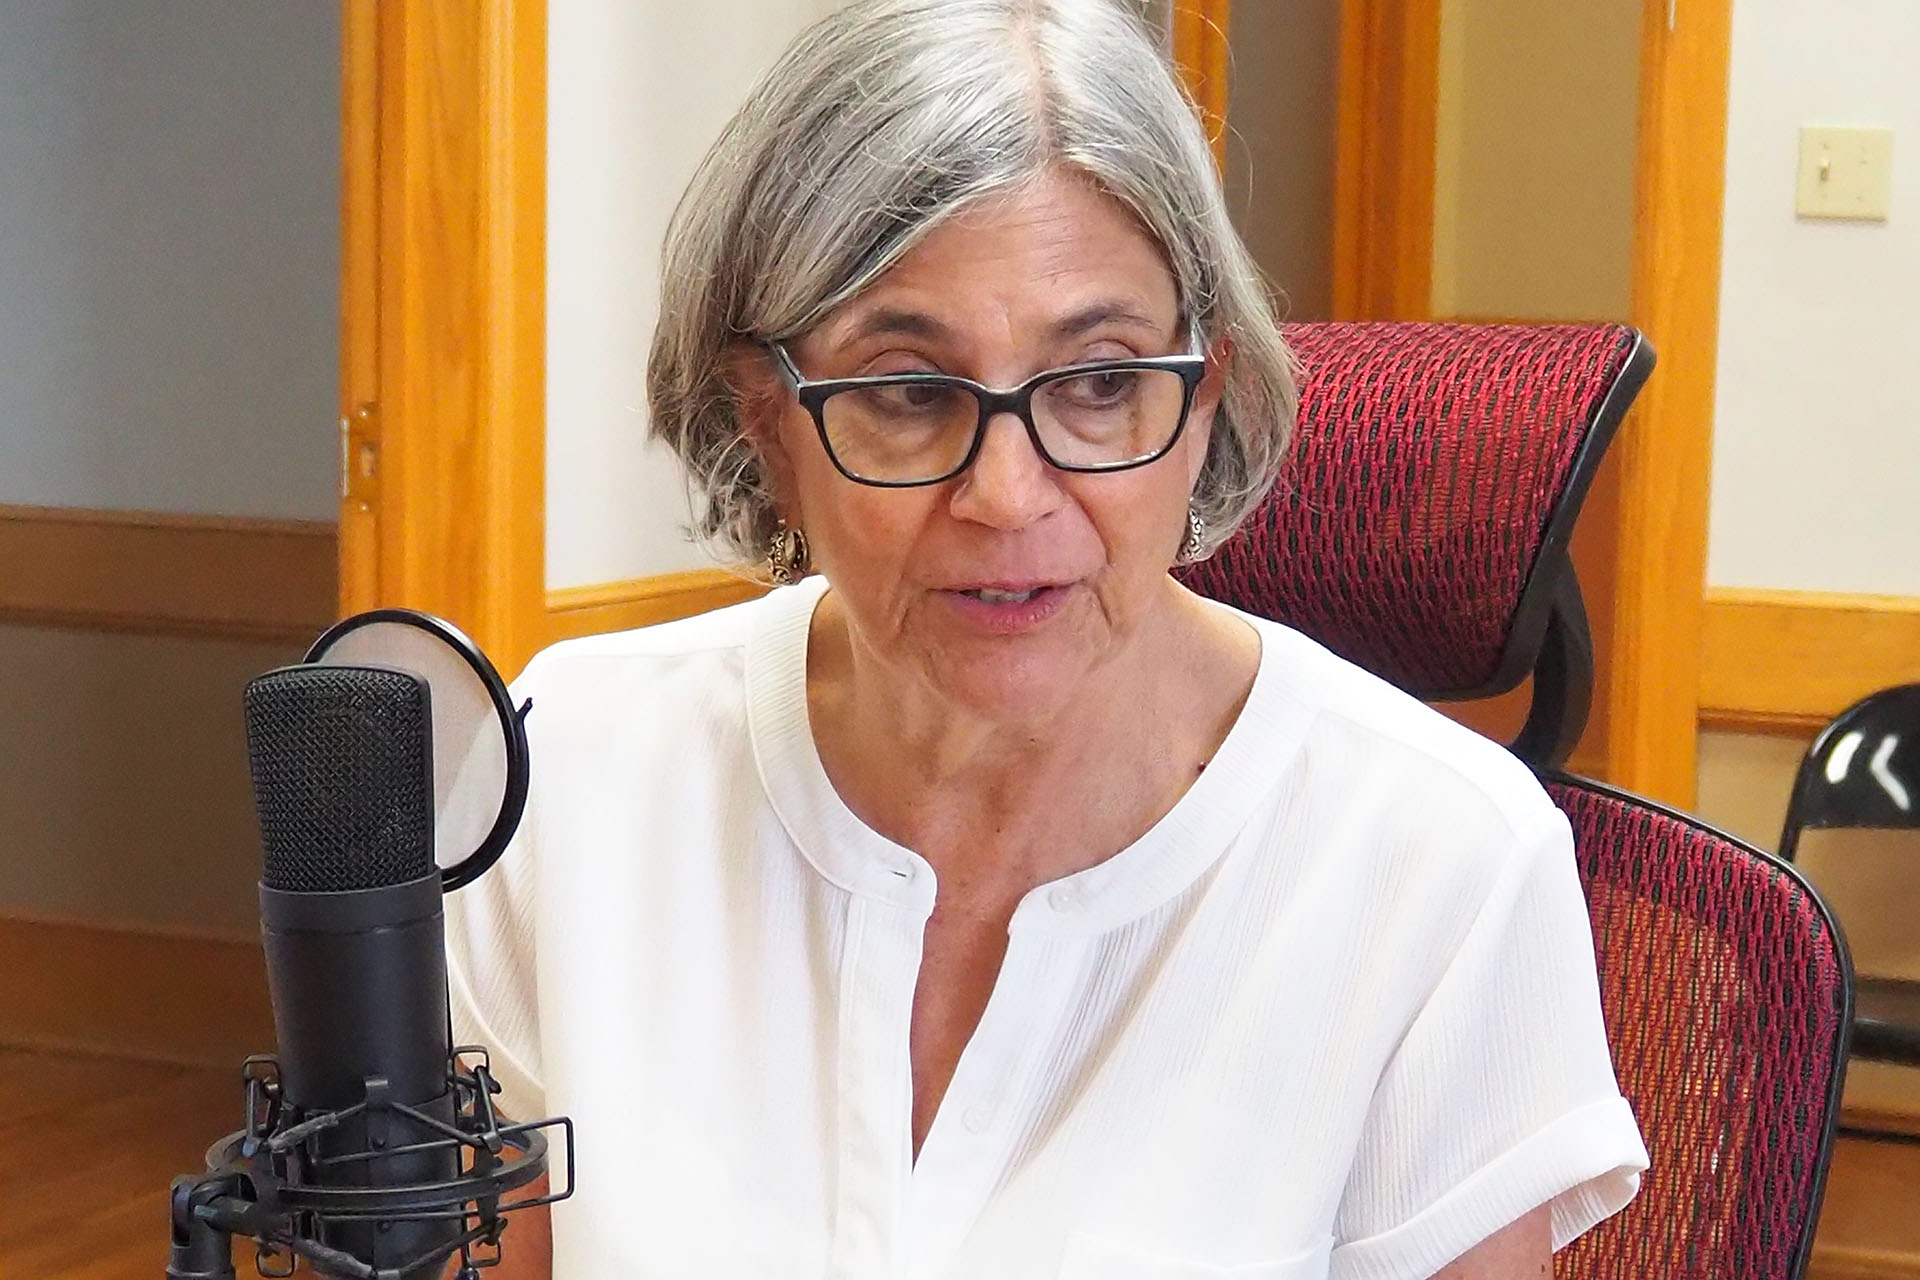 Senate President Susan Wagle embraces gerrymandering to benefit GOP in Kansas